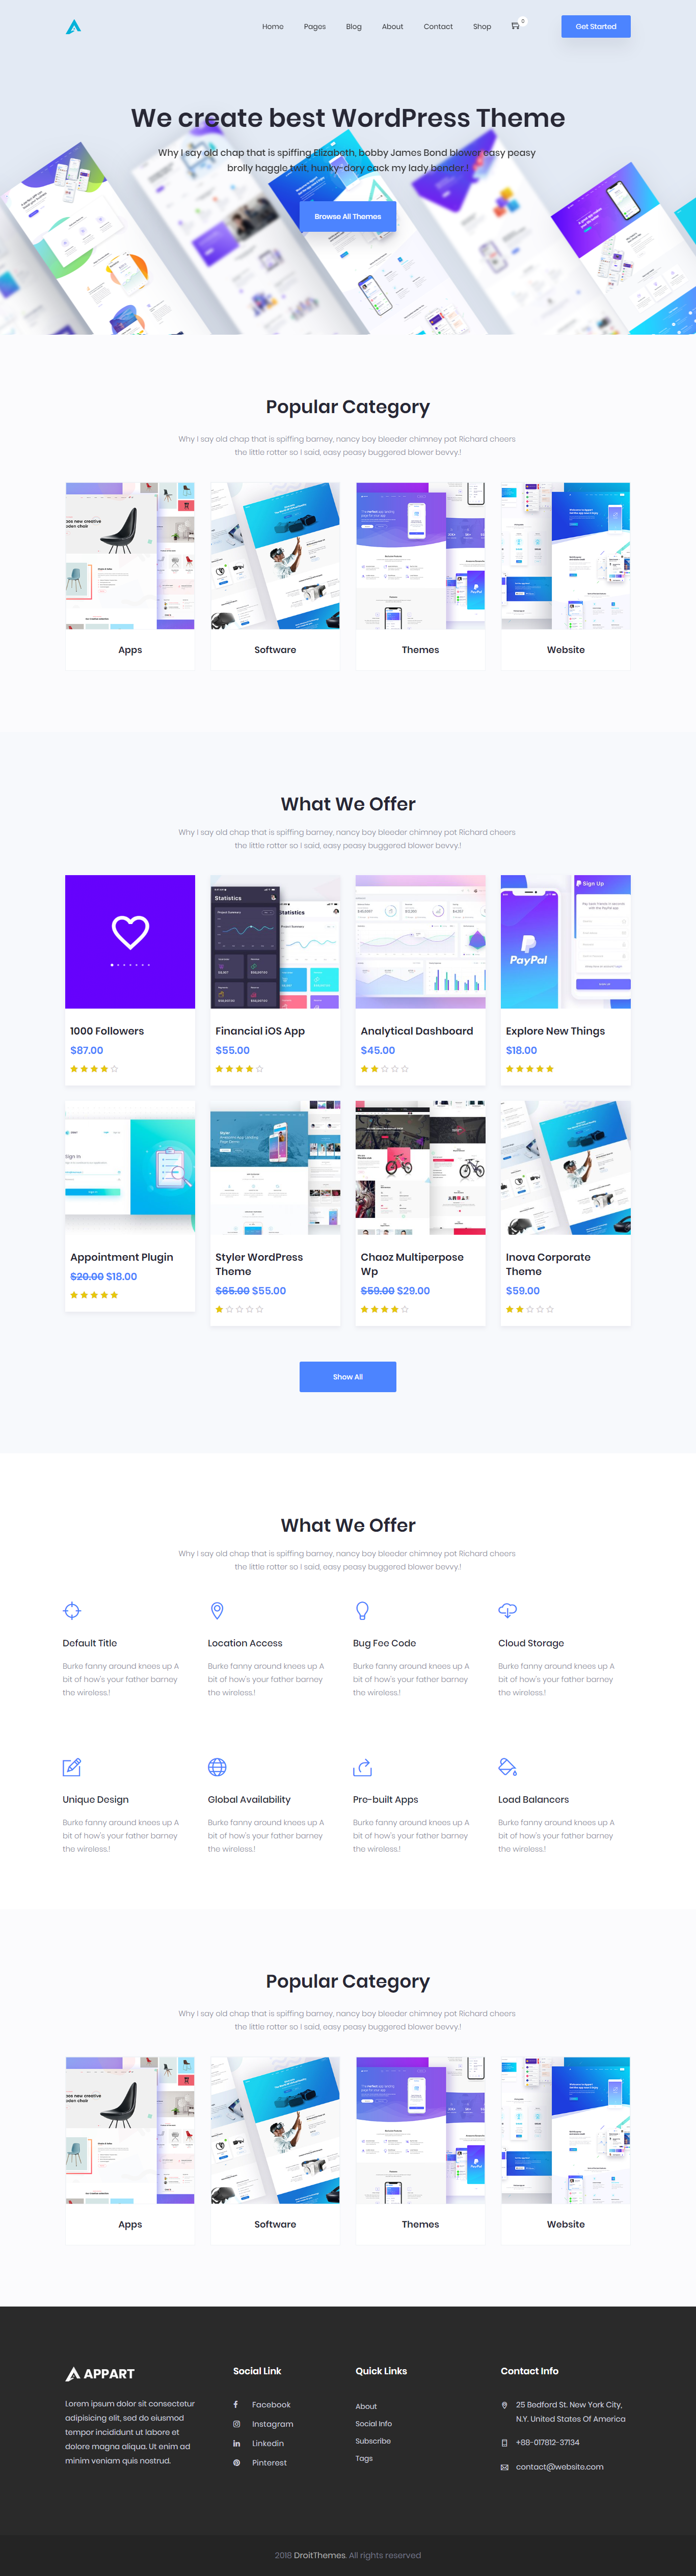 Appart Creative Wordpress Theme For Apps Saas Software Creative Wordpress Themes Wordpress Theme Web App Design